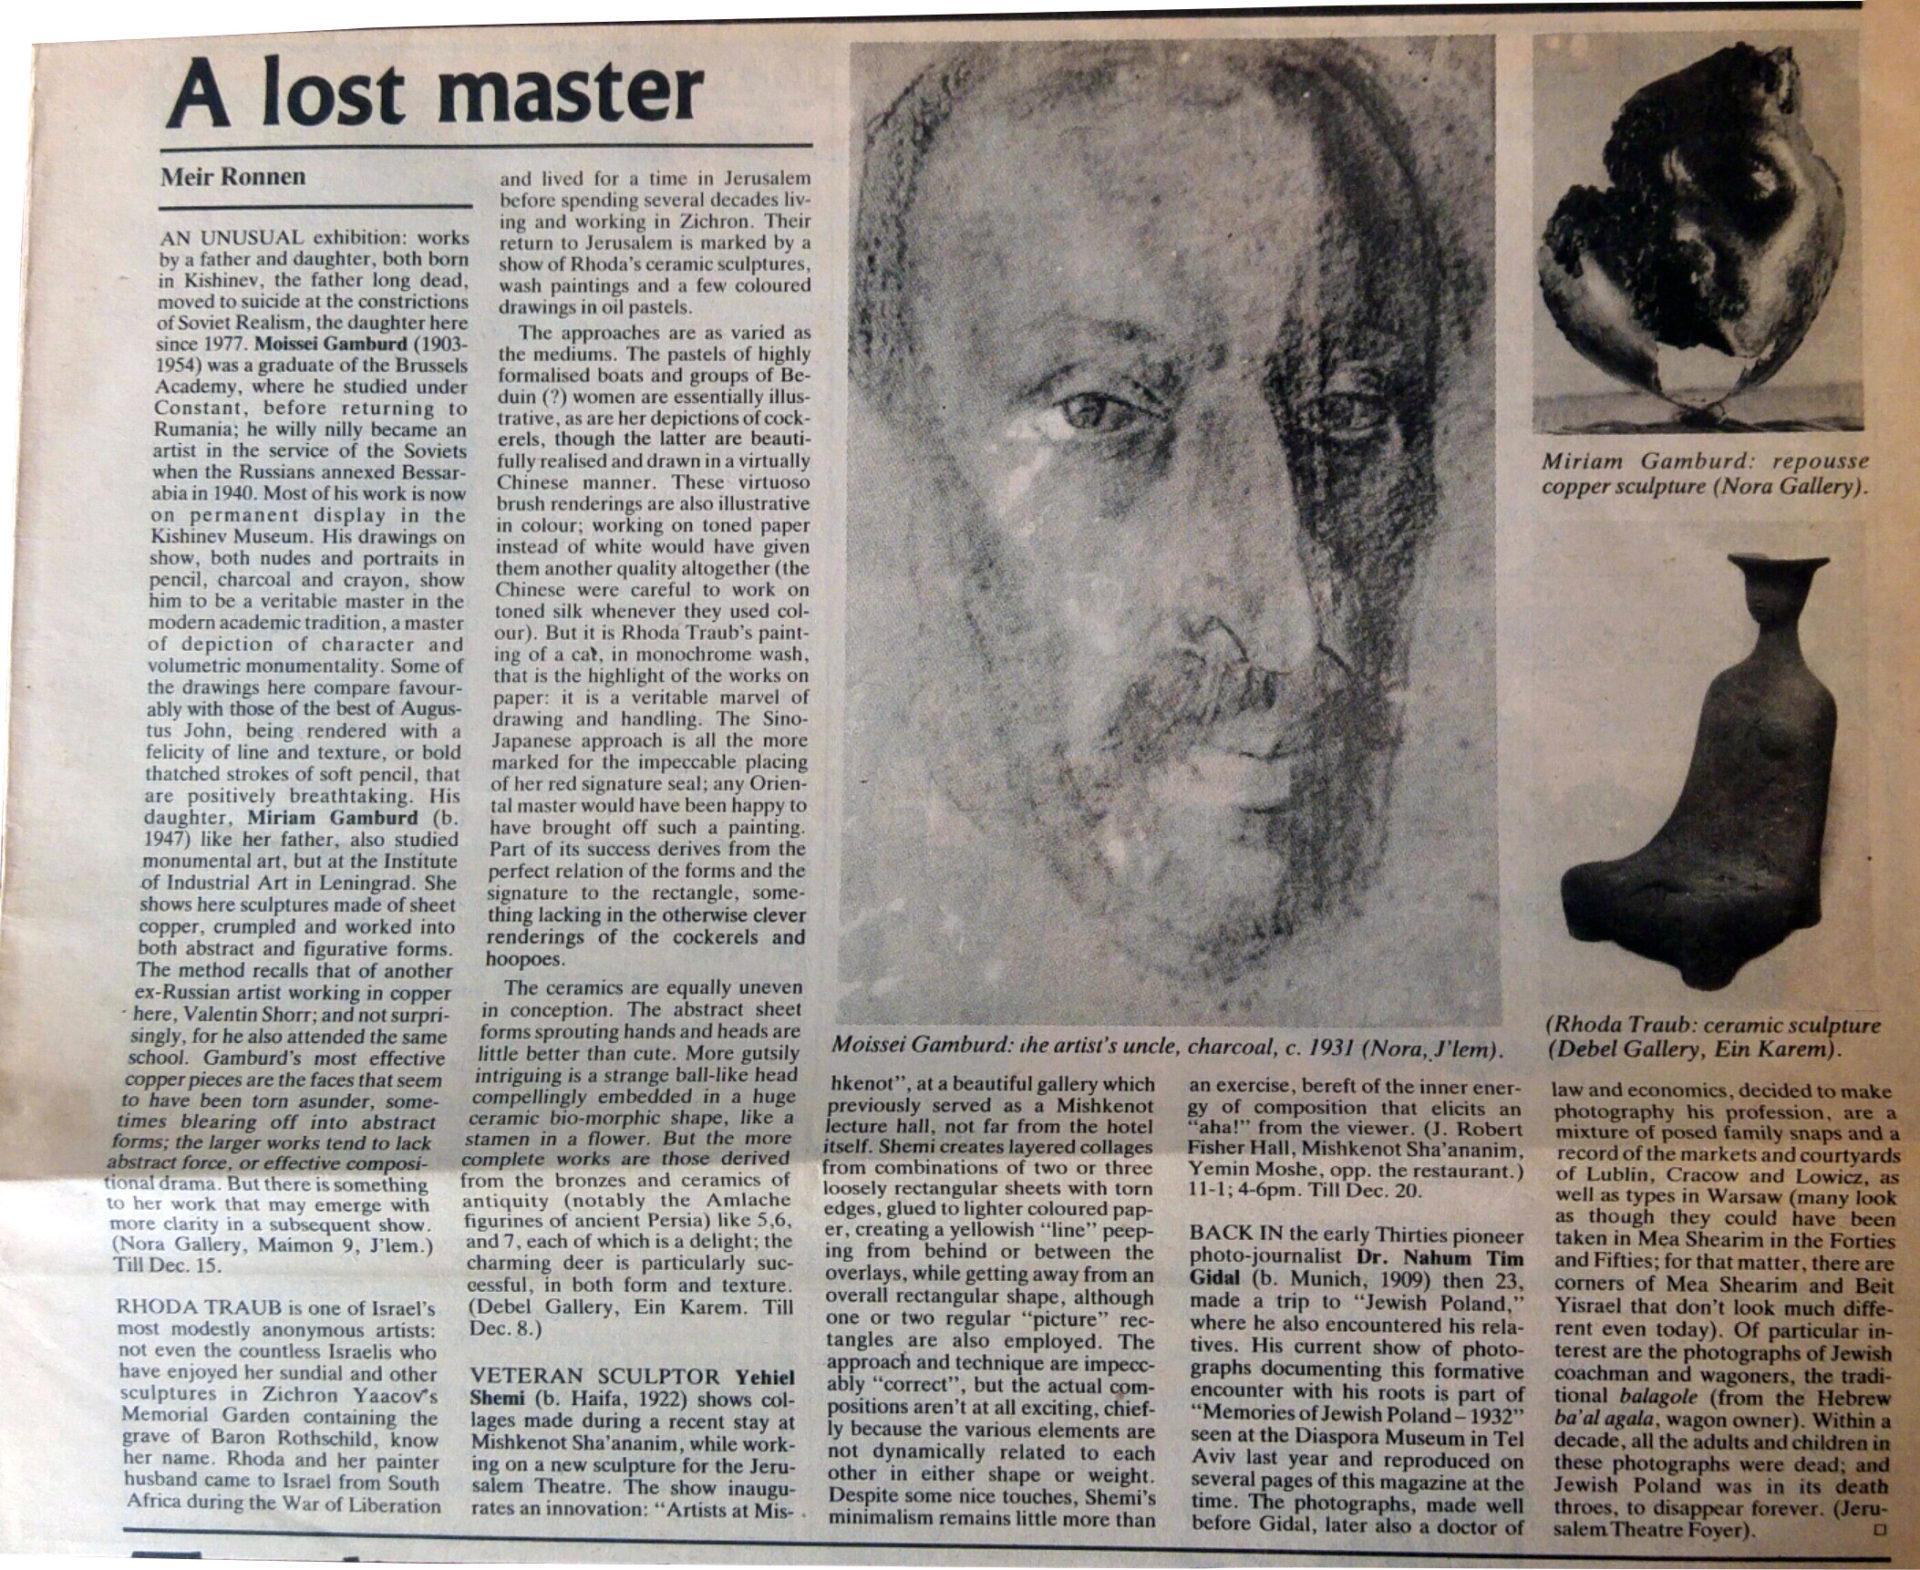 A Lost Master. Meir Ronnen, Jerusalem Post, 30.11.1984